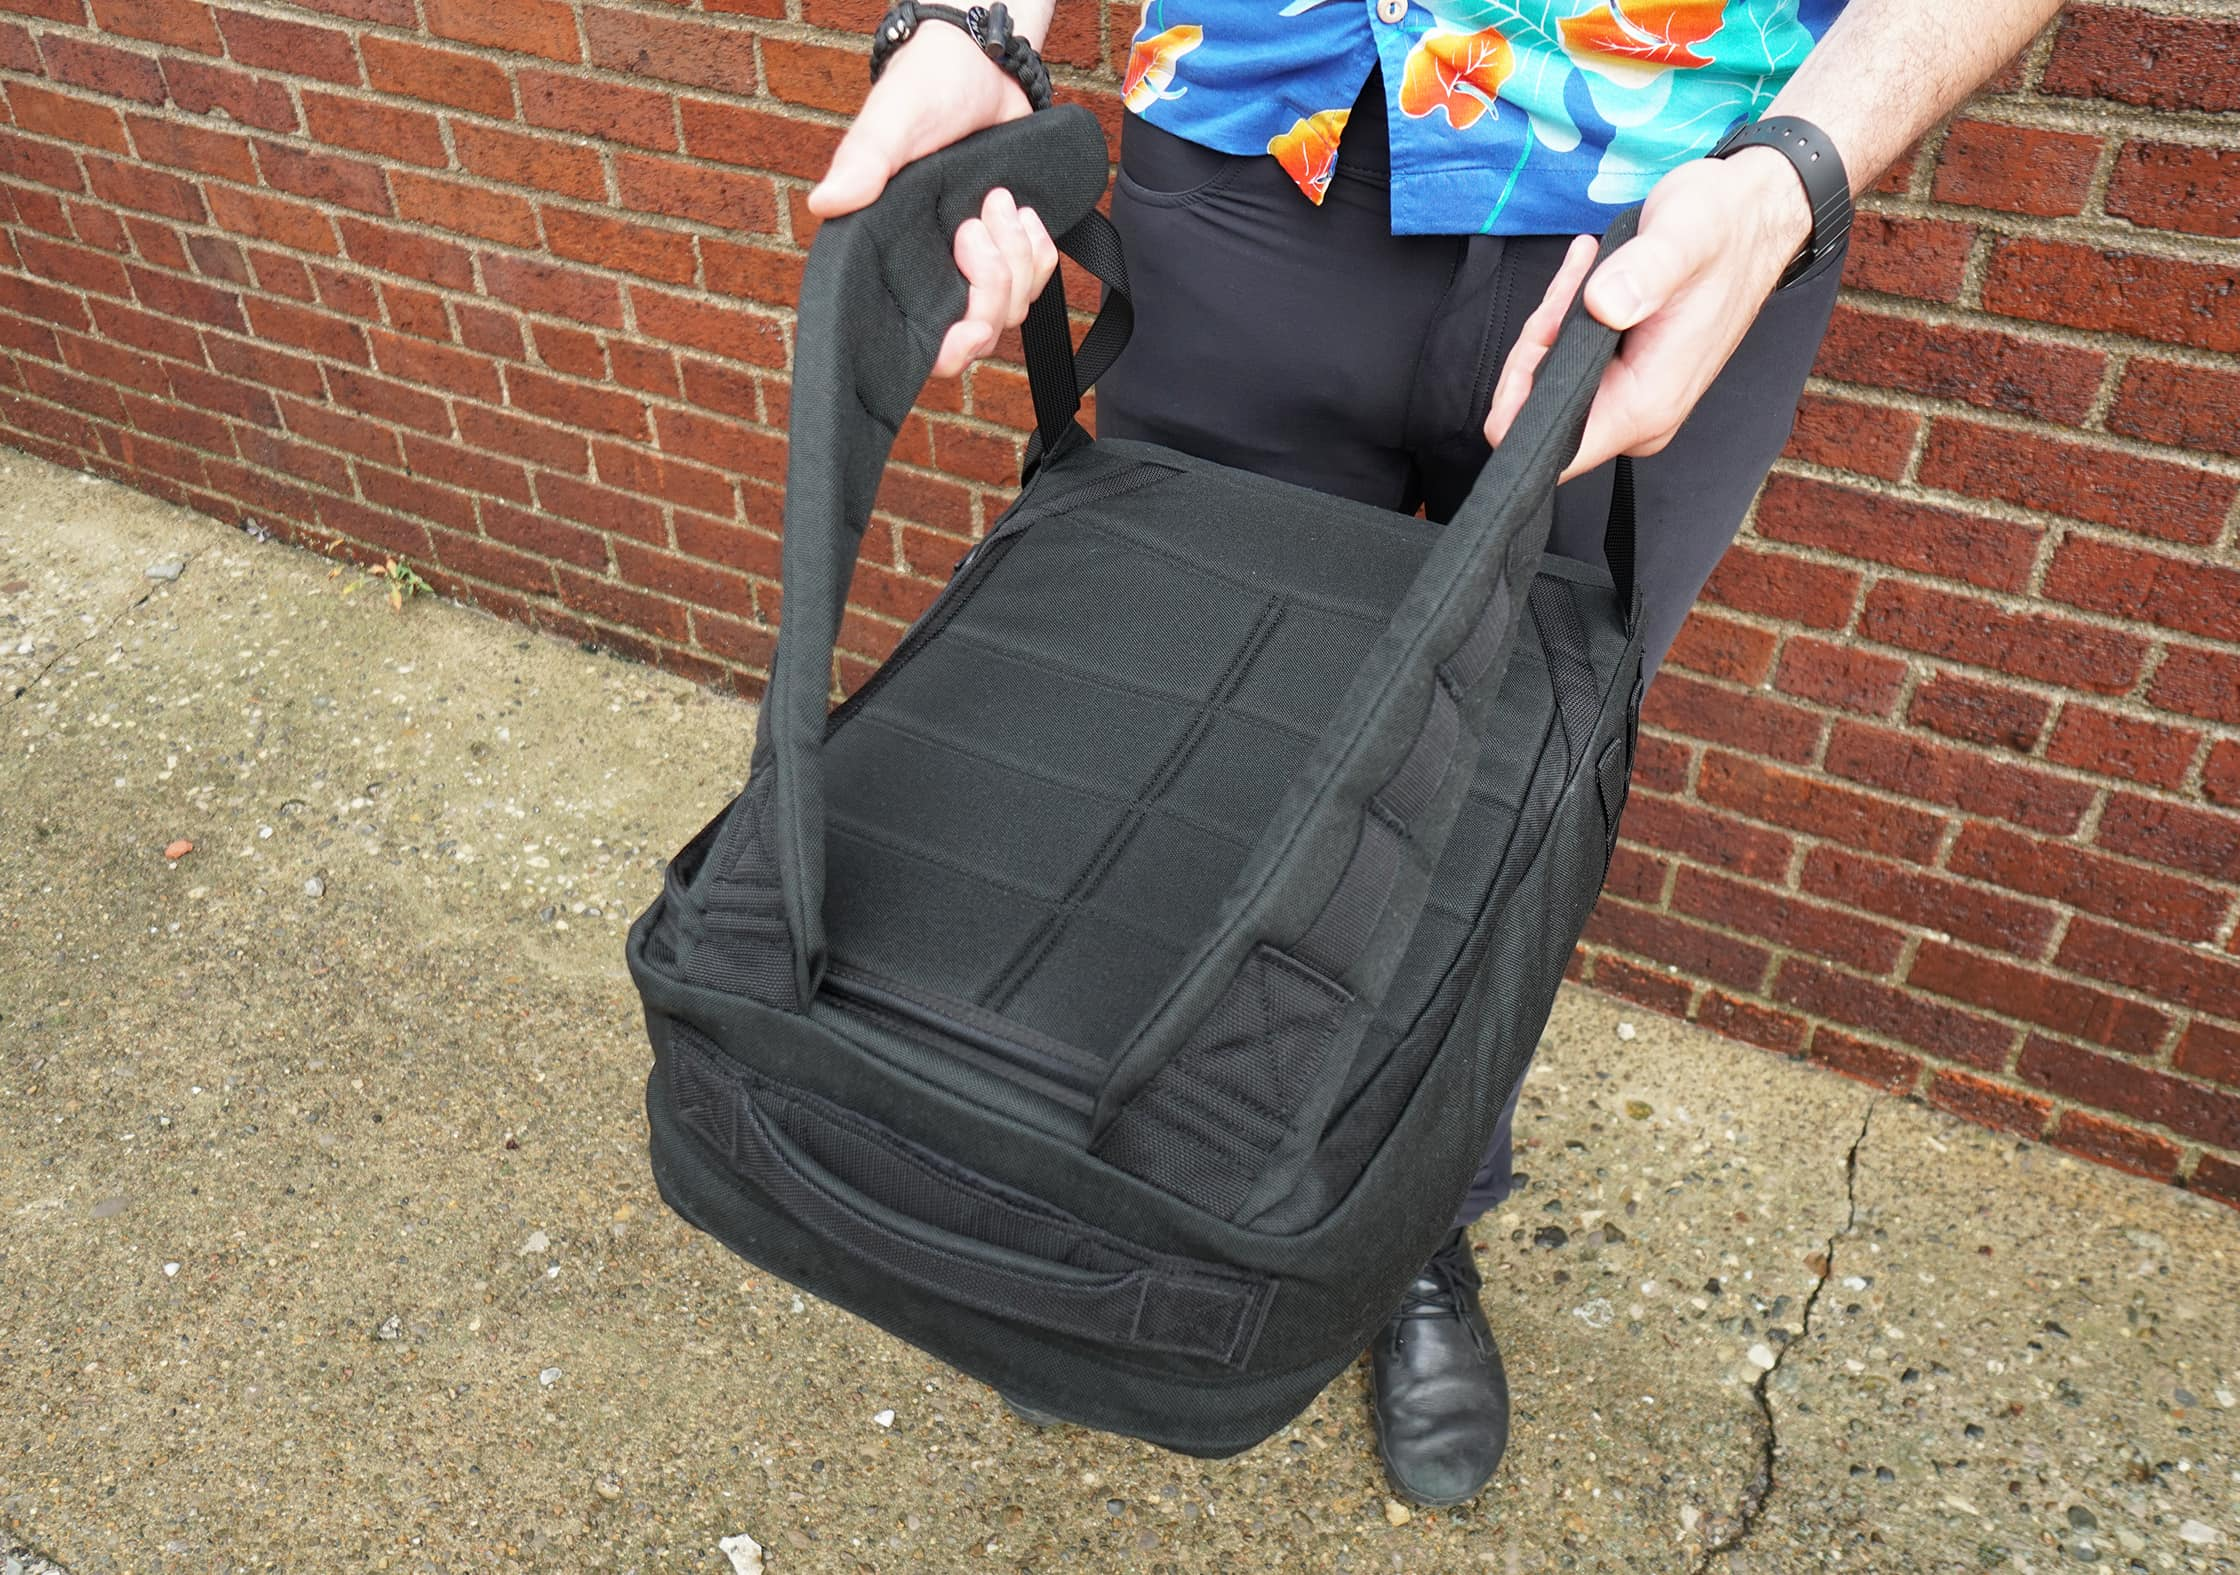 GORUCK GR1 Review (Travel Backpack) | Pack Hacker